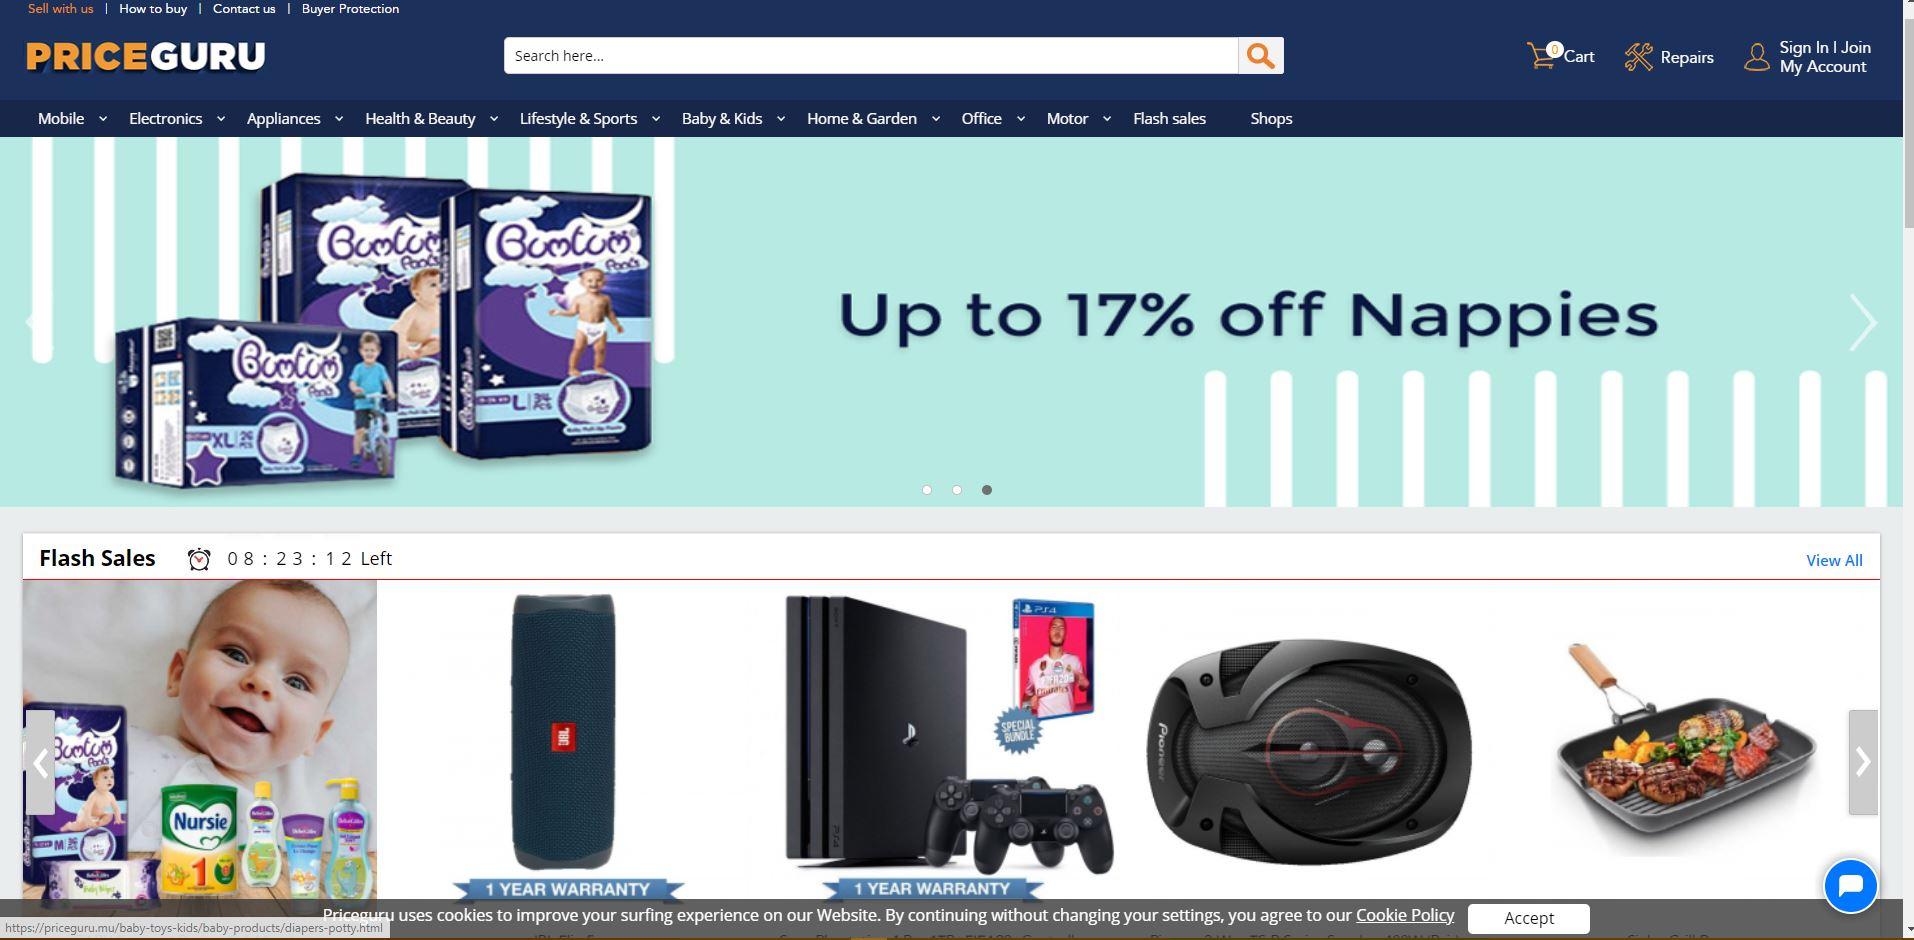 PriceGuru-Digital-Marketing-Mauritius-Ecommerce